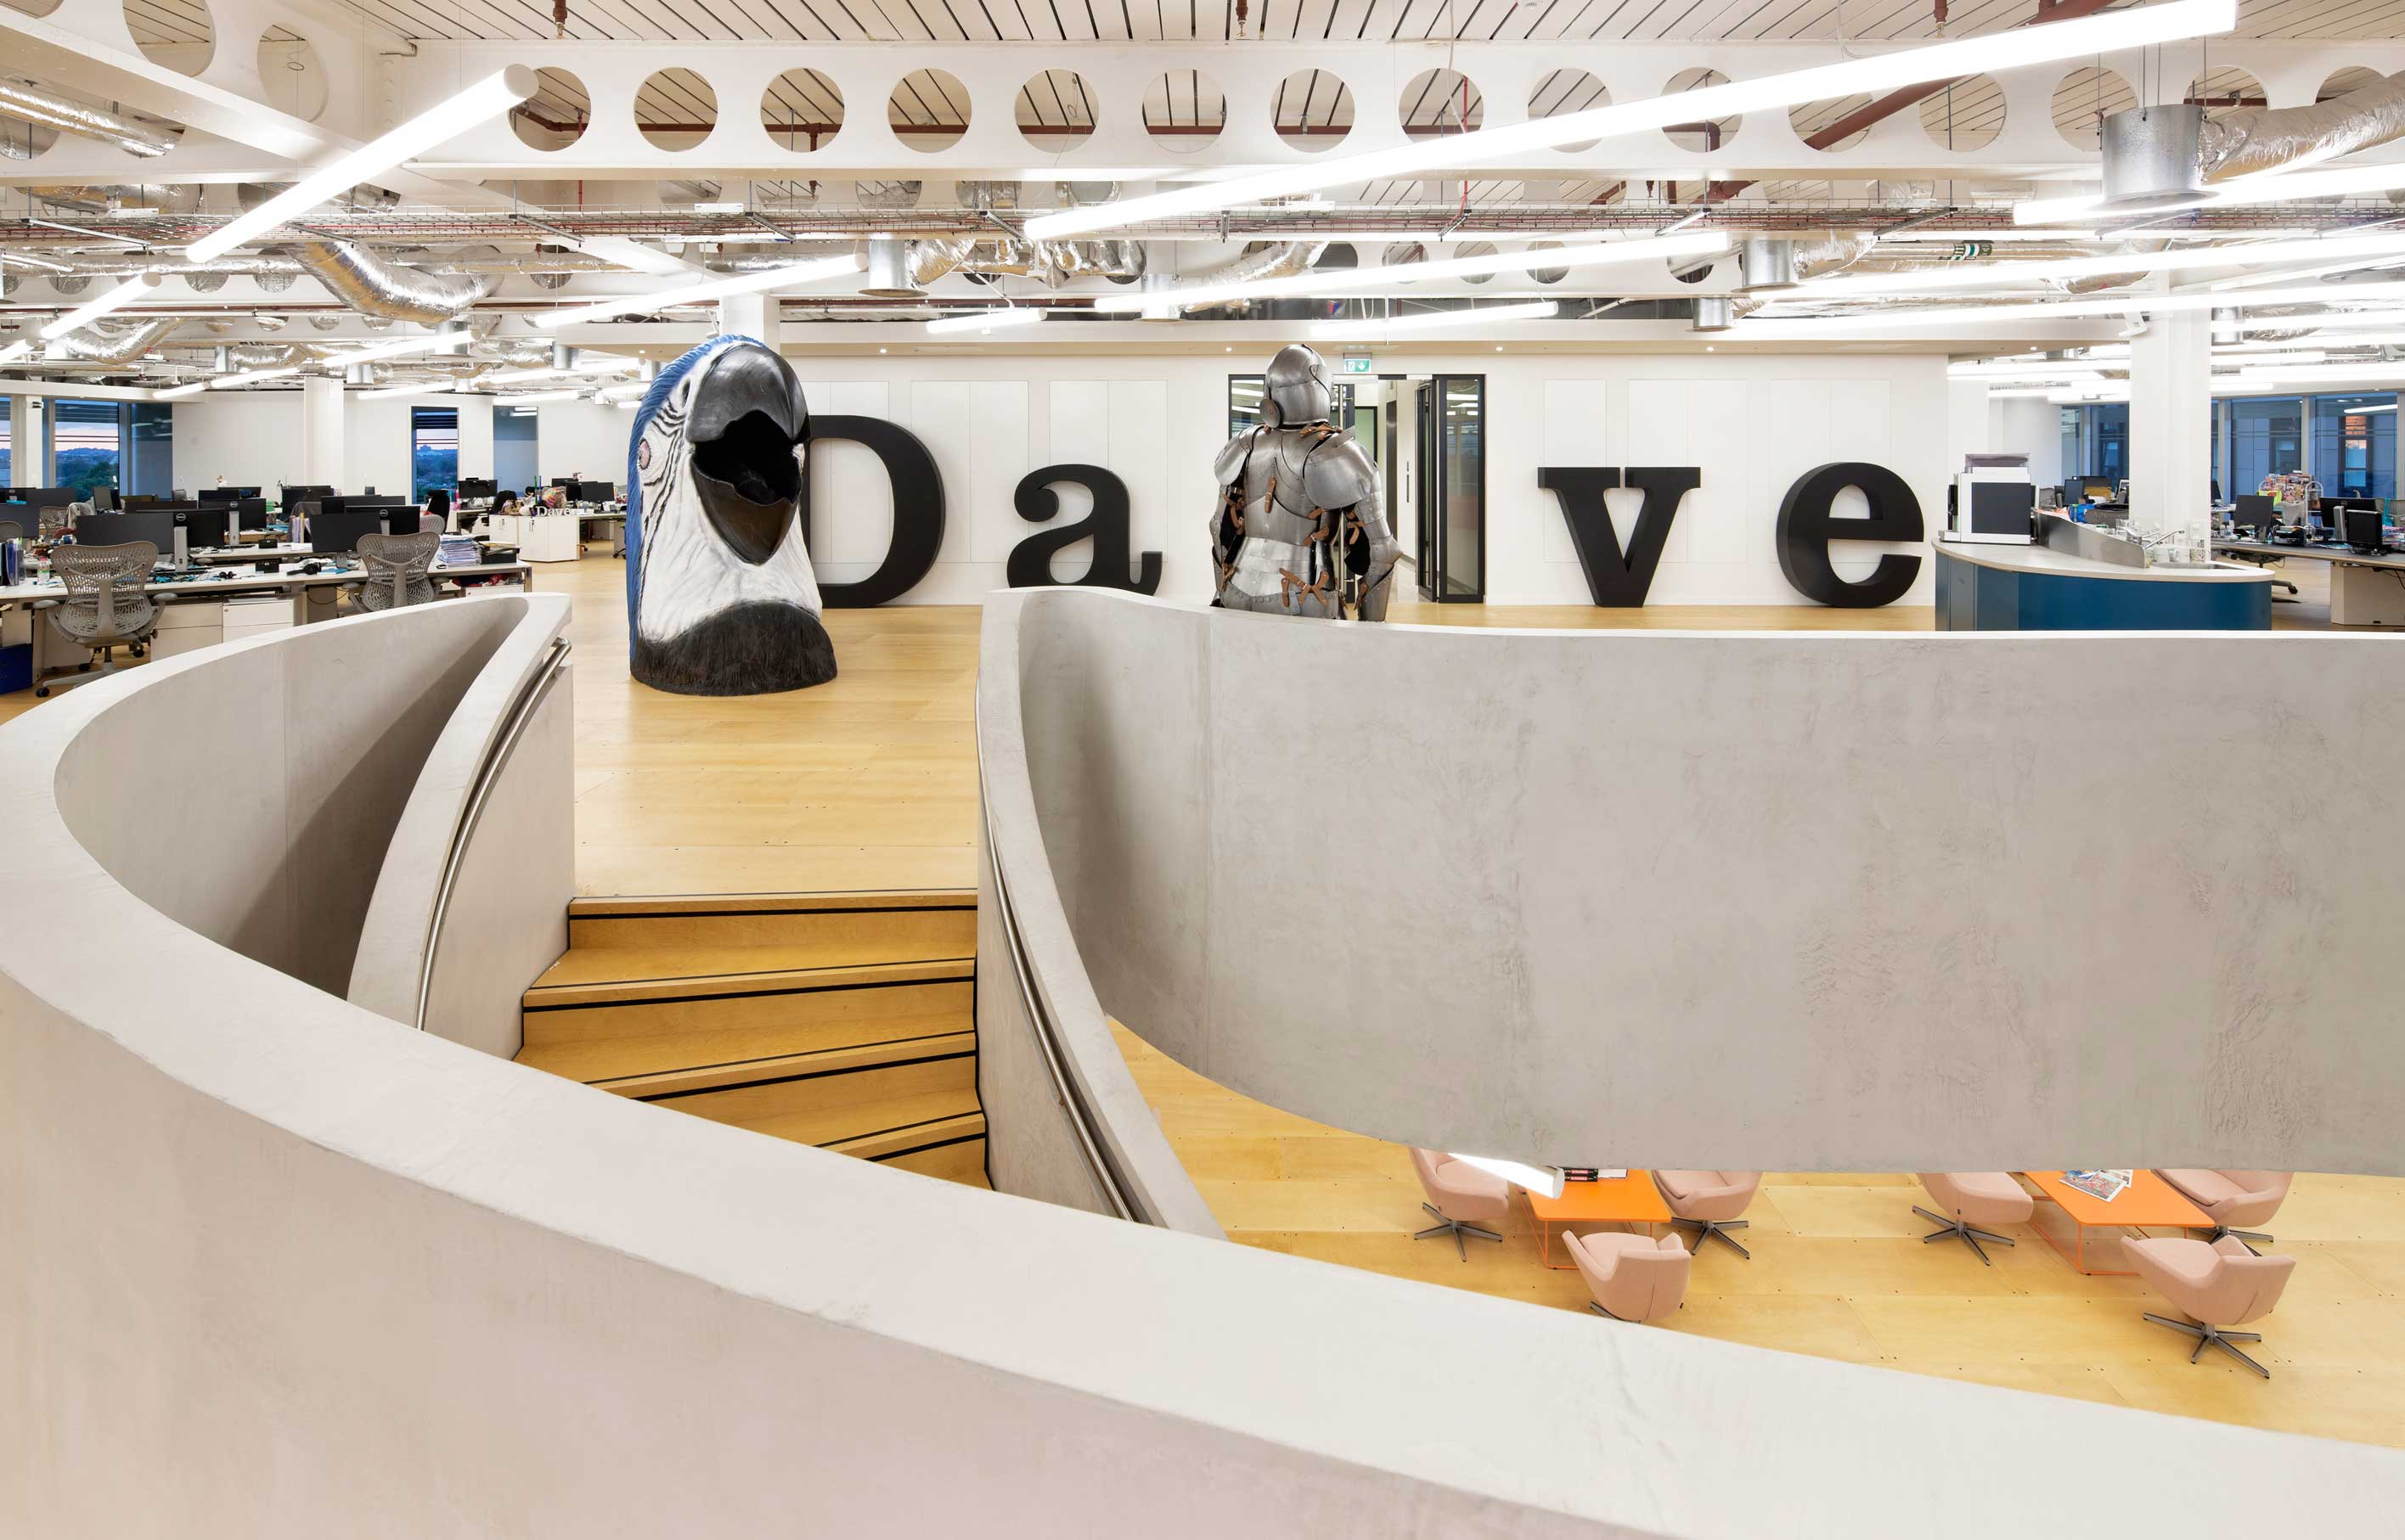 modern office interior design uktv. UKTV, HAMMERSMITH, LONDON | Quality House Builder And Refurbishment In Bath Modern Office Interior Design Uktv T